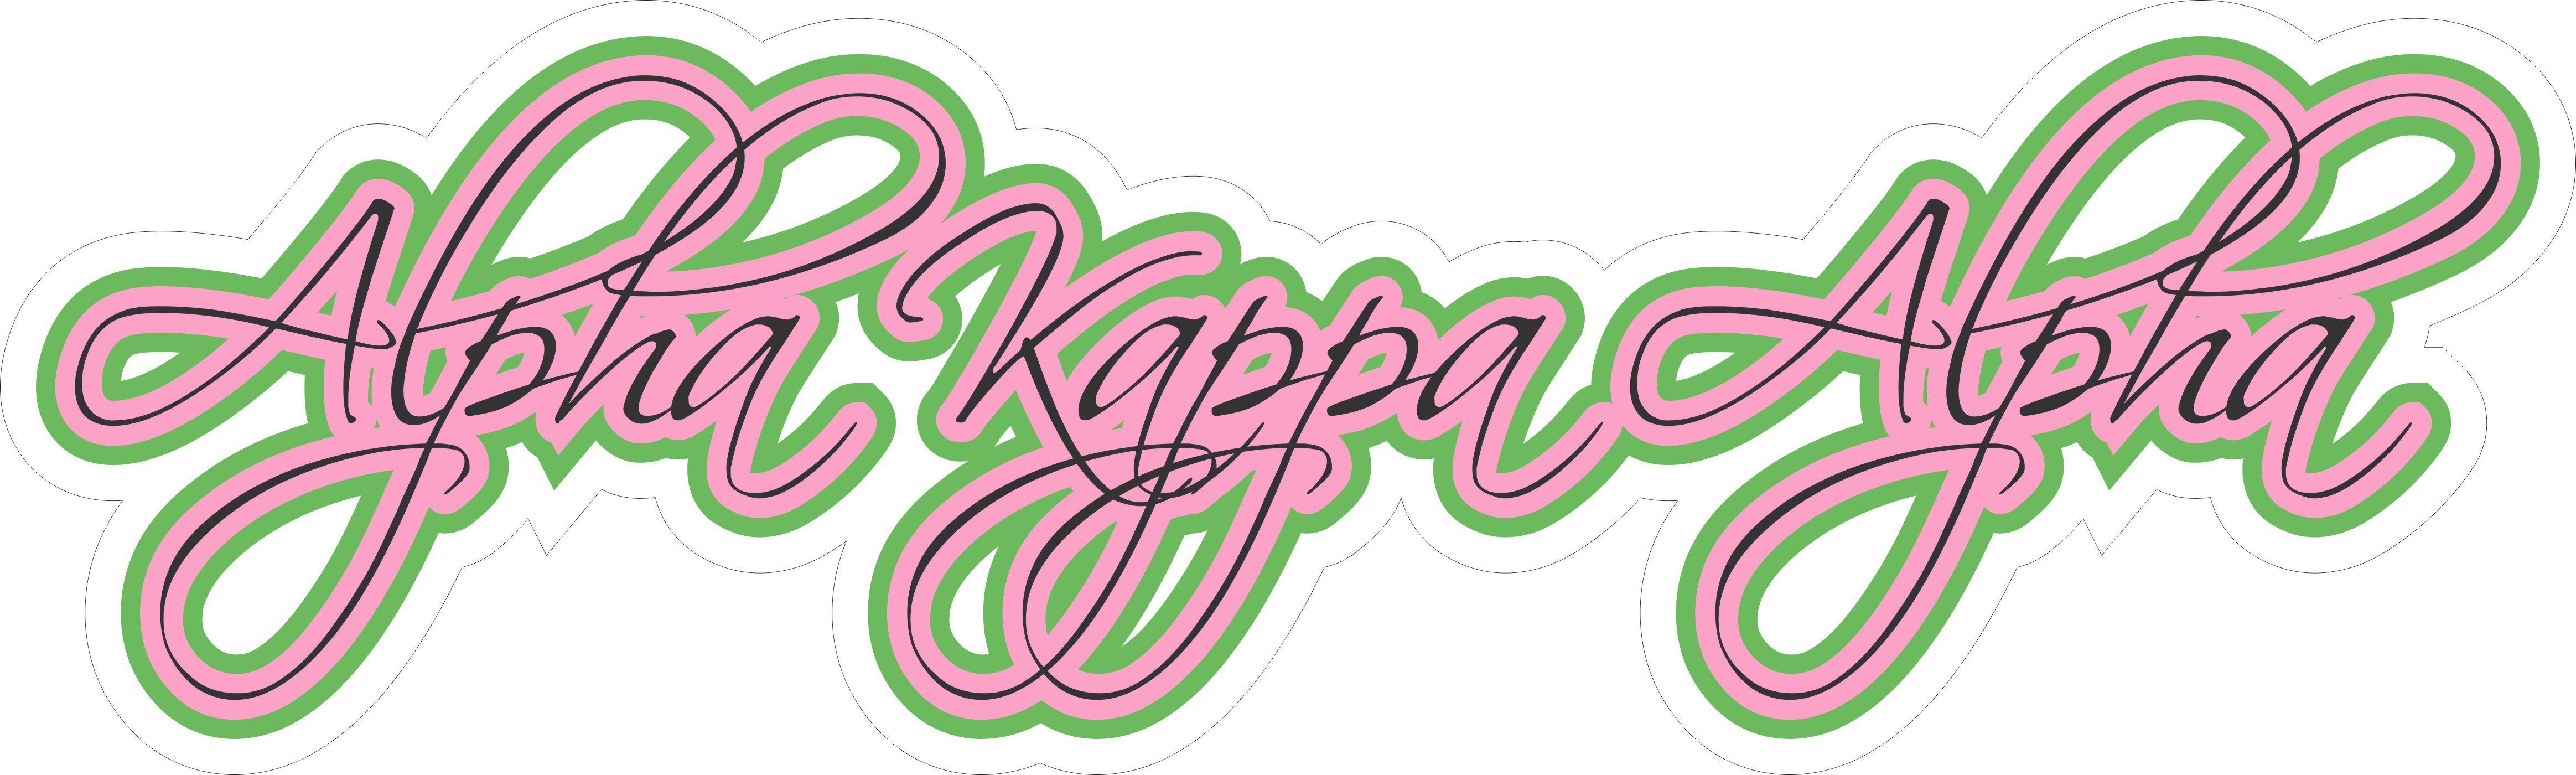 alpha kappa alpha sorority clip art pretty in pink green rh pinterest com Alpha Kappa Alpha Ivy Alpha Kappa Alpha Symbols